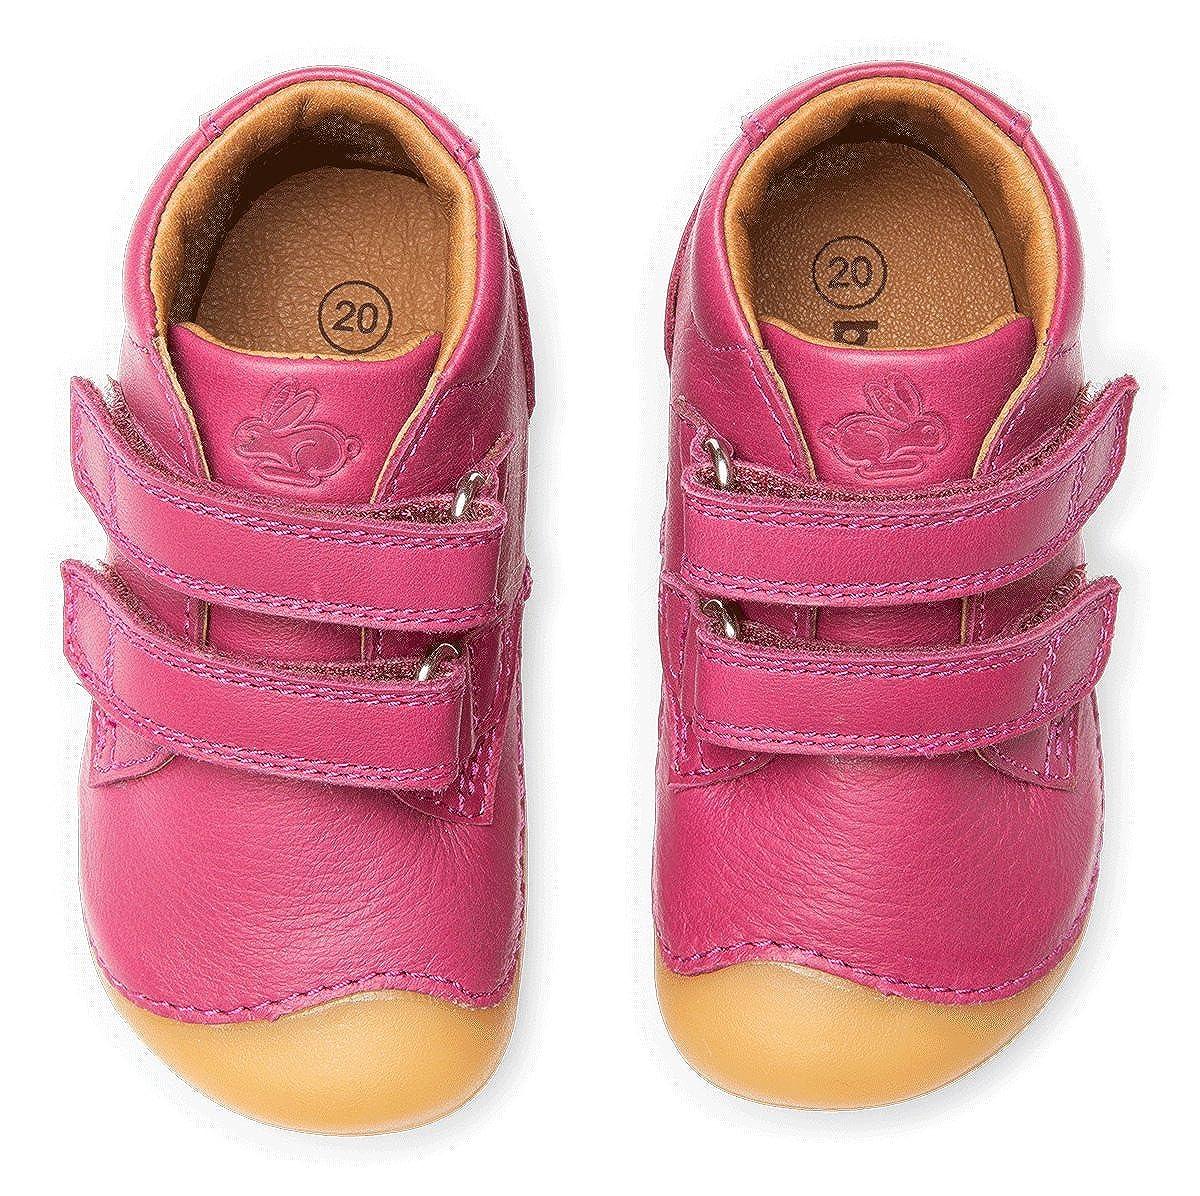 5055a65e1d ... Lauflernschuhe, Kinderschuhe für Mädchen und Jungen (Petit Velcro)  BG101068 Brown ...